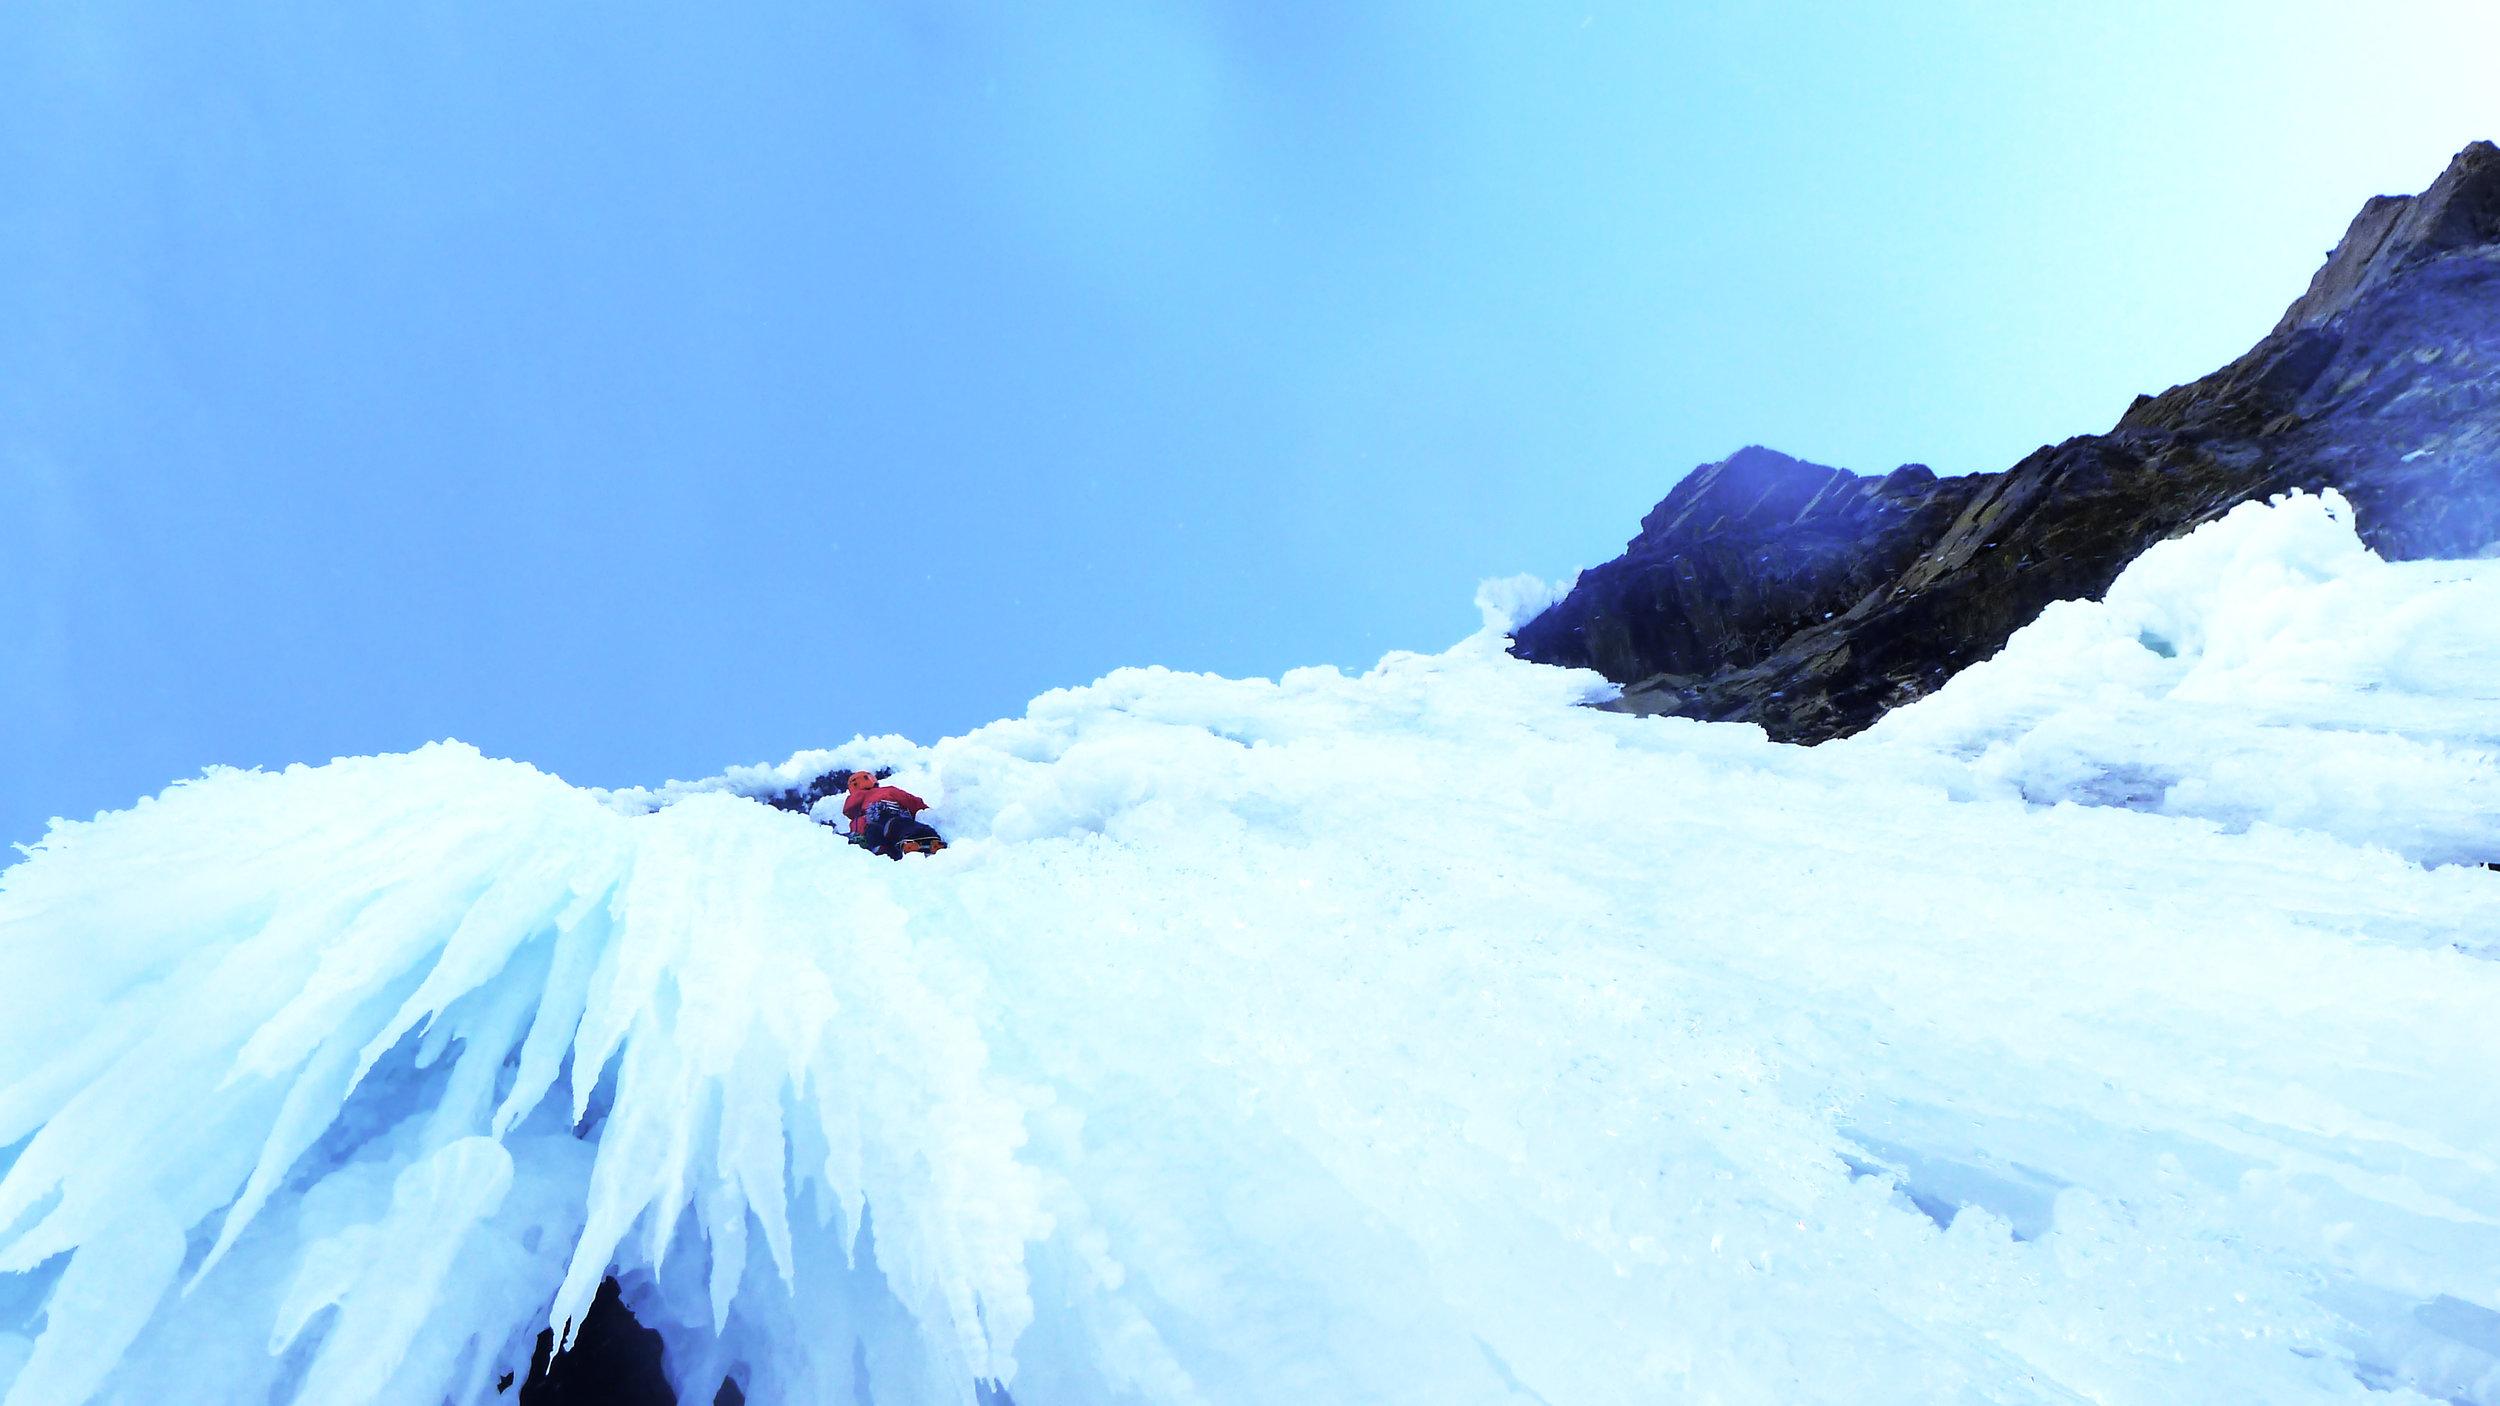 Matthias Scherer on Virtual Reality November 2012, Icefieldsparkway, Canada picture Tanja Schmitt